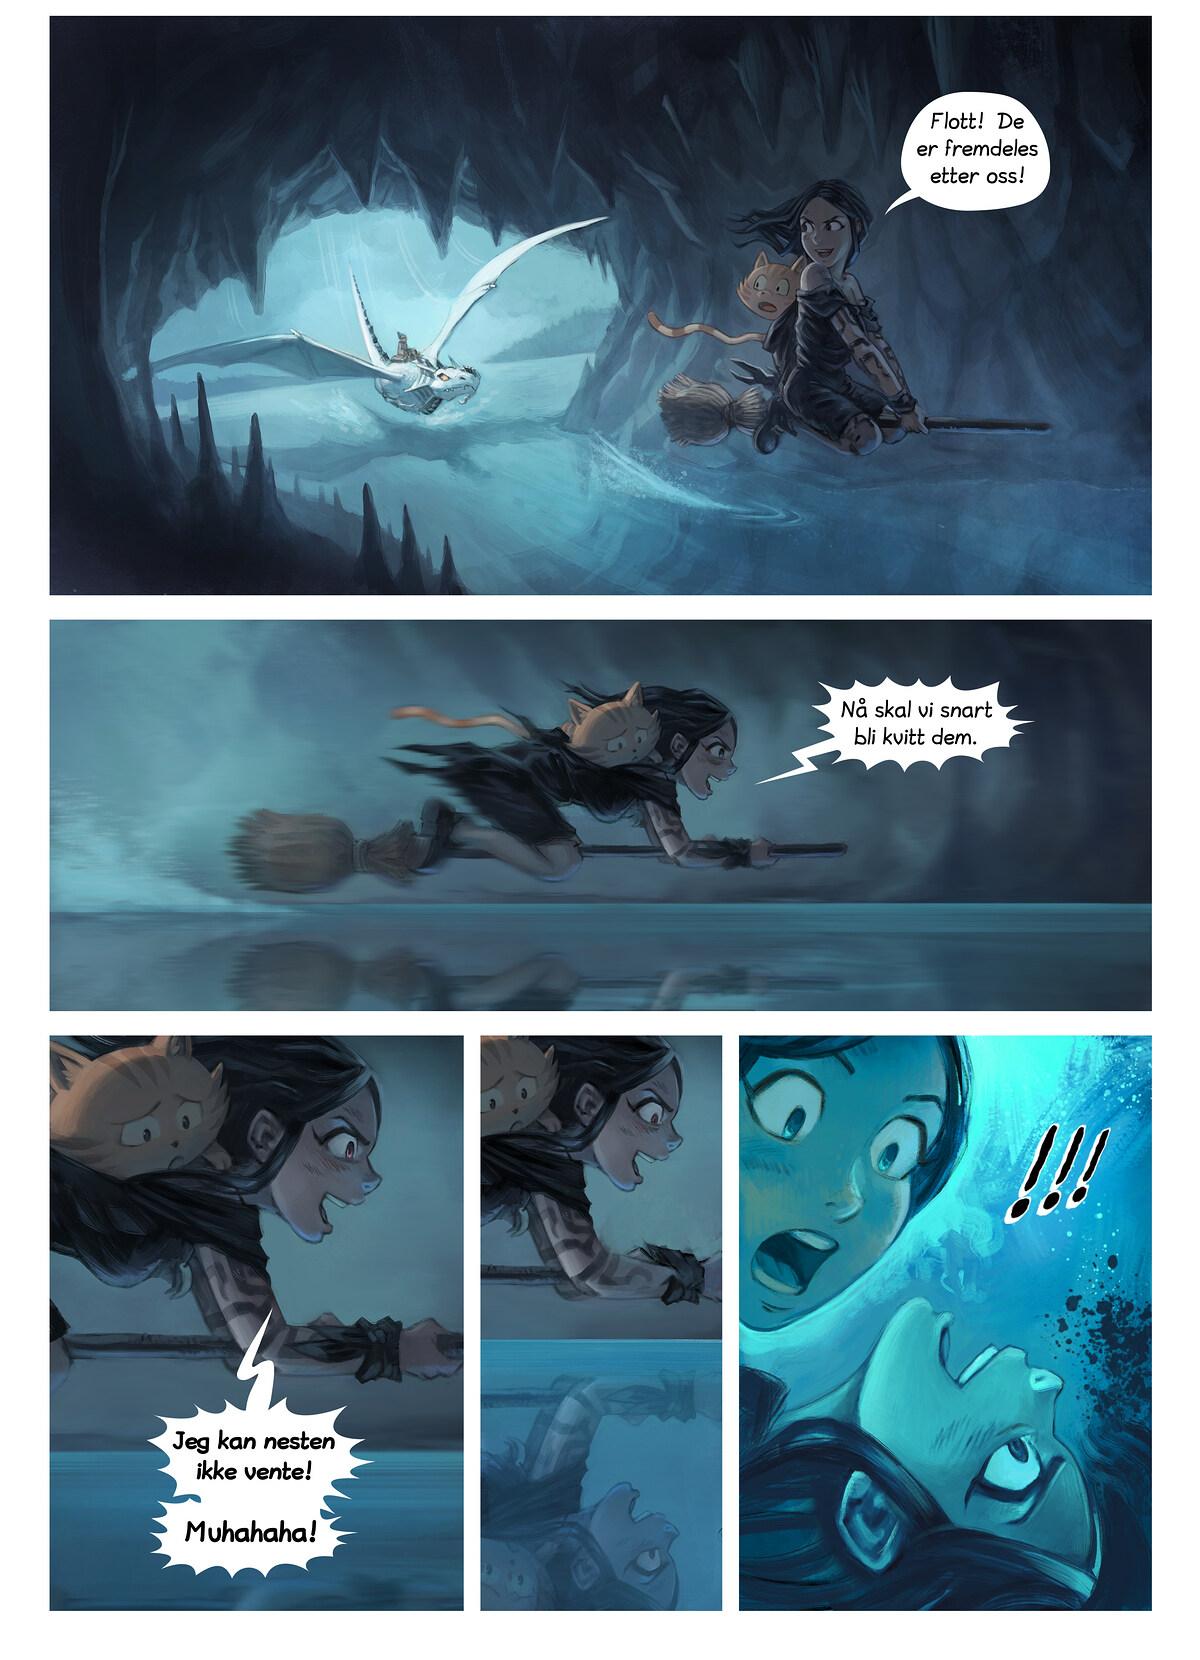 Episode 35: Tid for ettertanke, Page 7